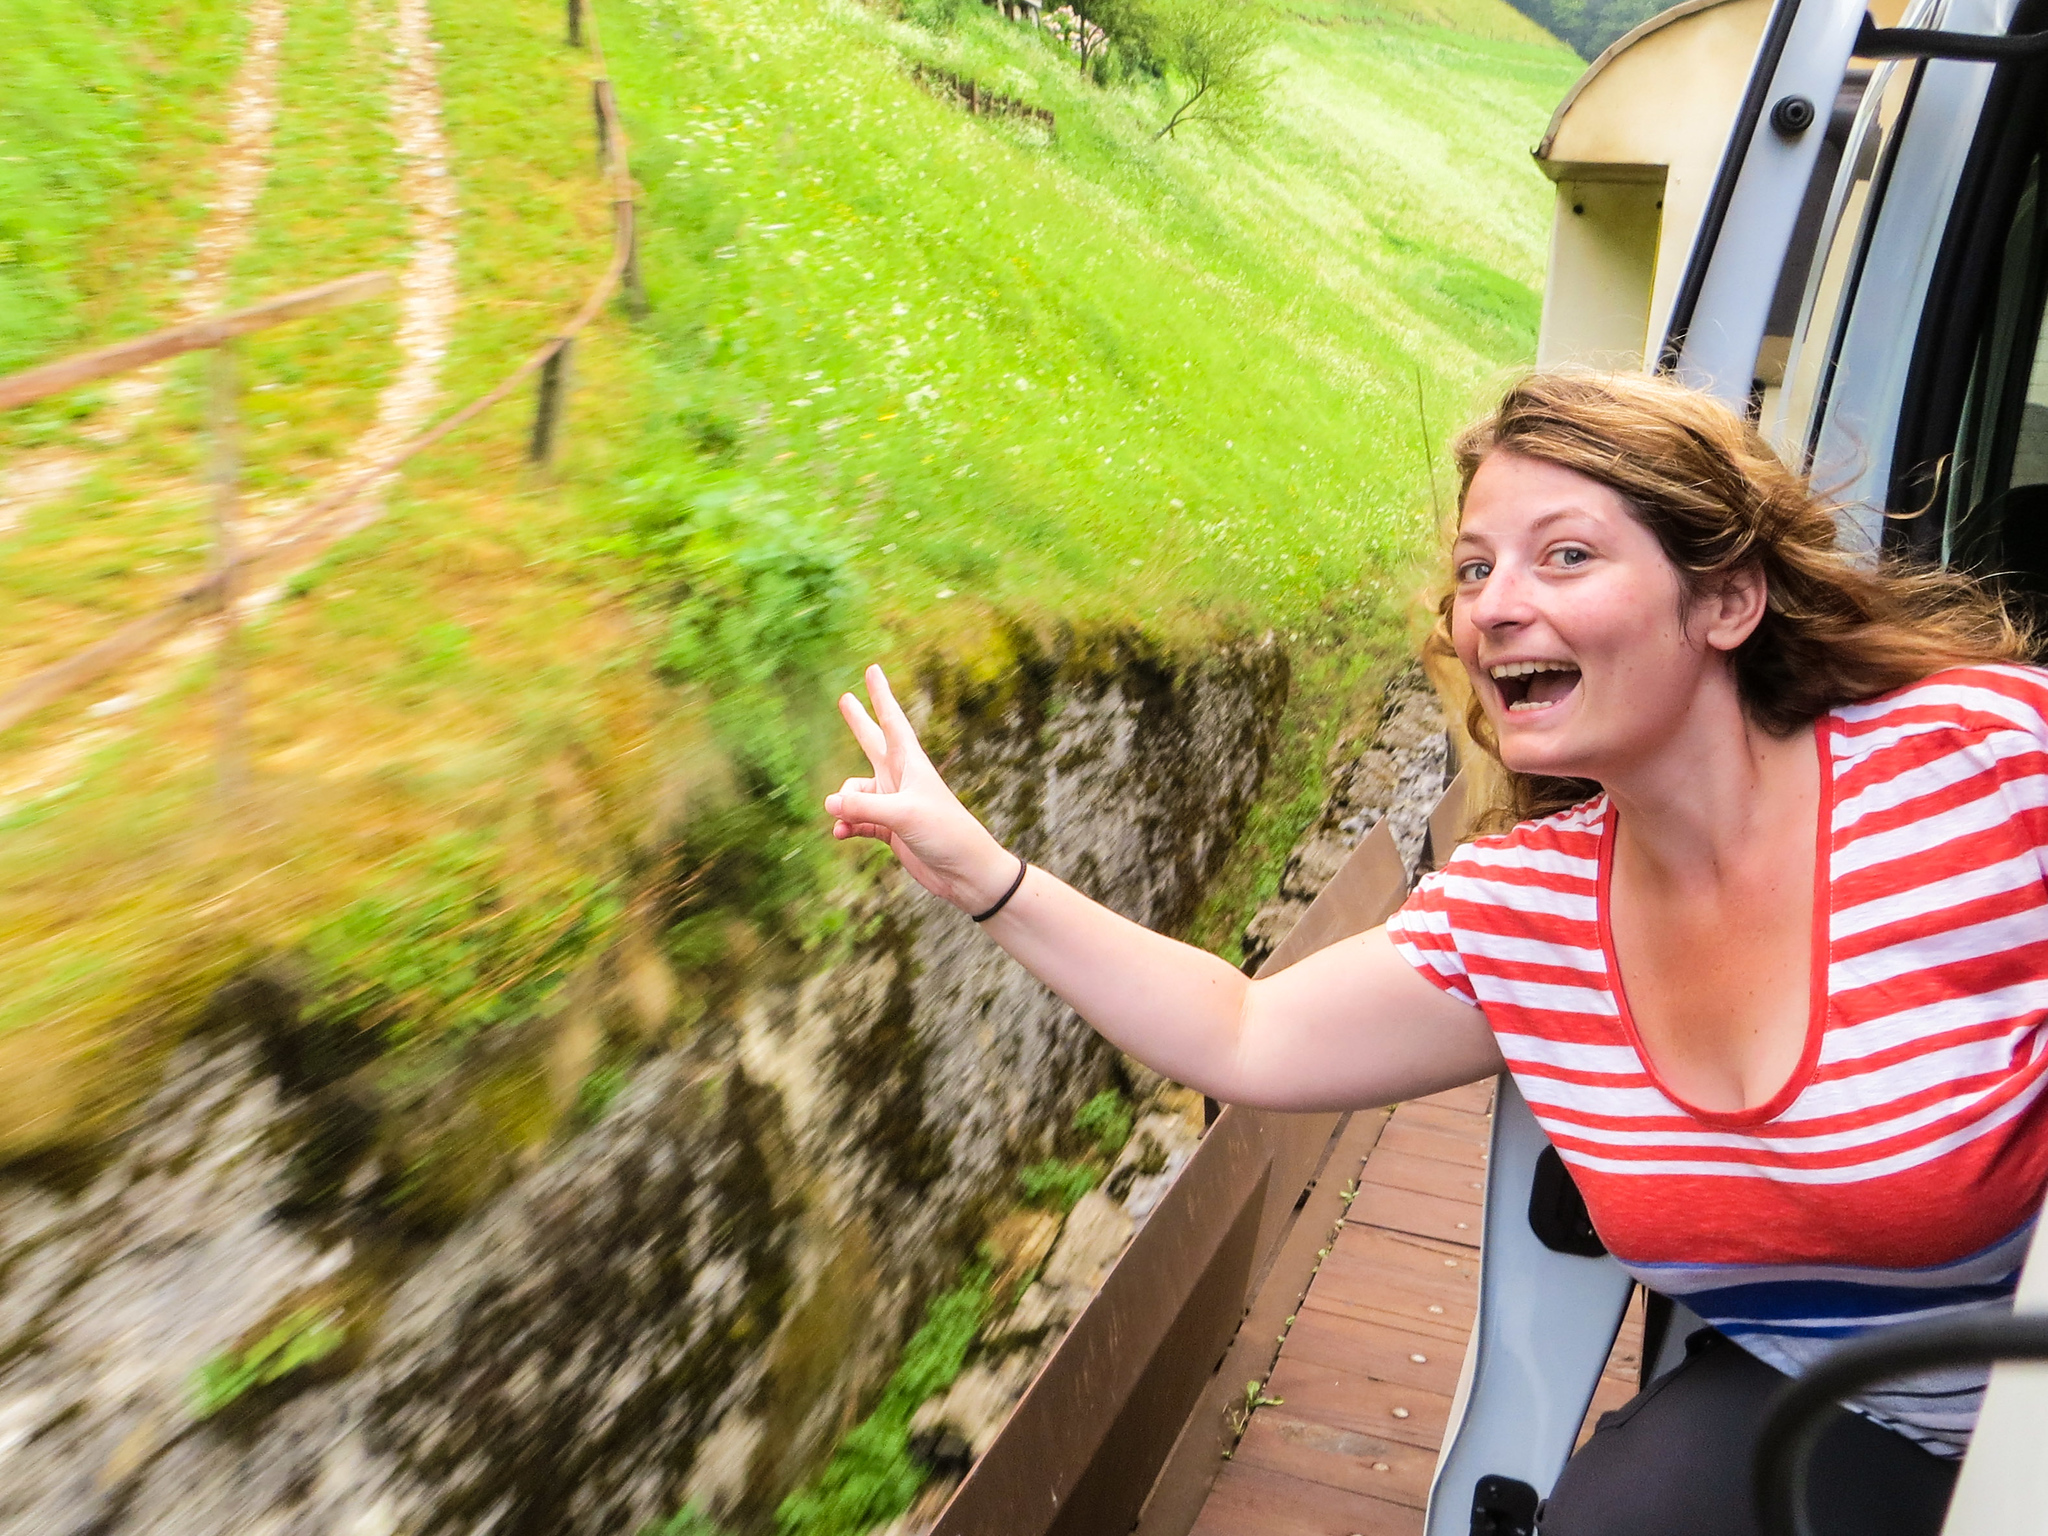 i hope my flying internationally tips helped you! smile!